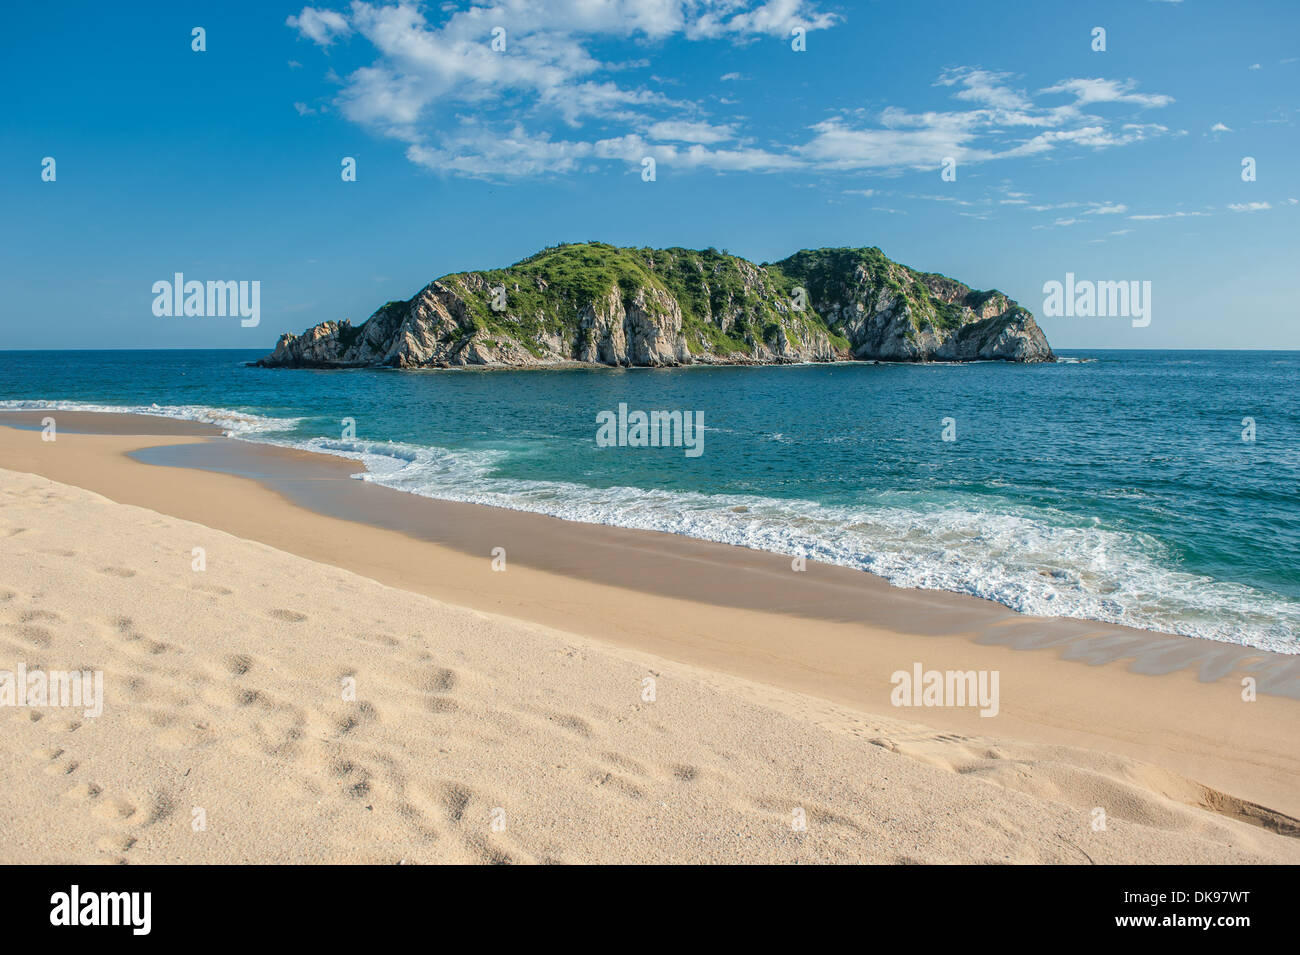 Cacaluta beach in Huatulko, Oaxaca, Mexico - Stock Image